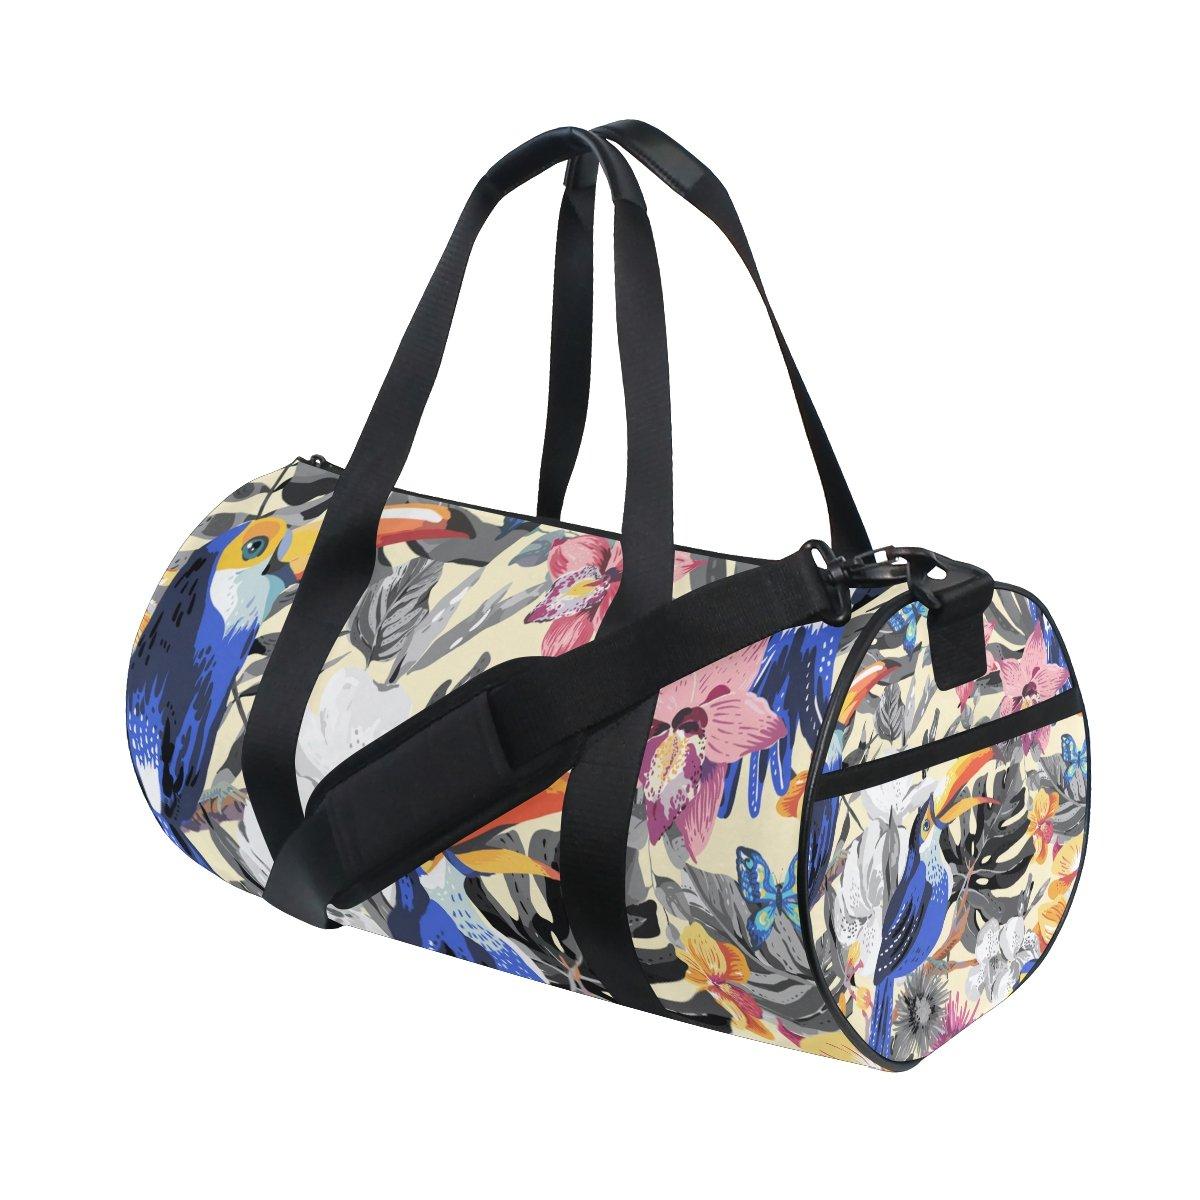 U LIFE Summer Tropical Animals Birds Floral Flowers Sports Gym Shoulder Handy Duffel Bags for Women Men Kids Boys Girls